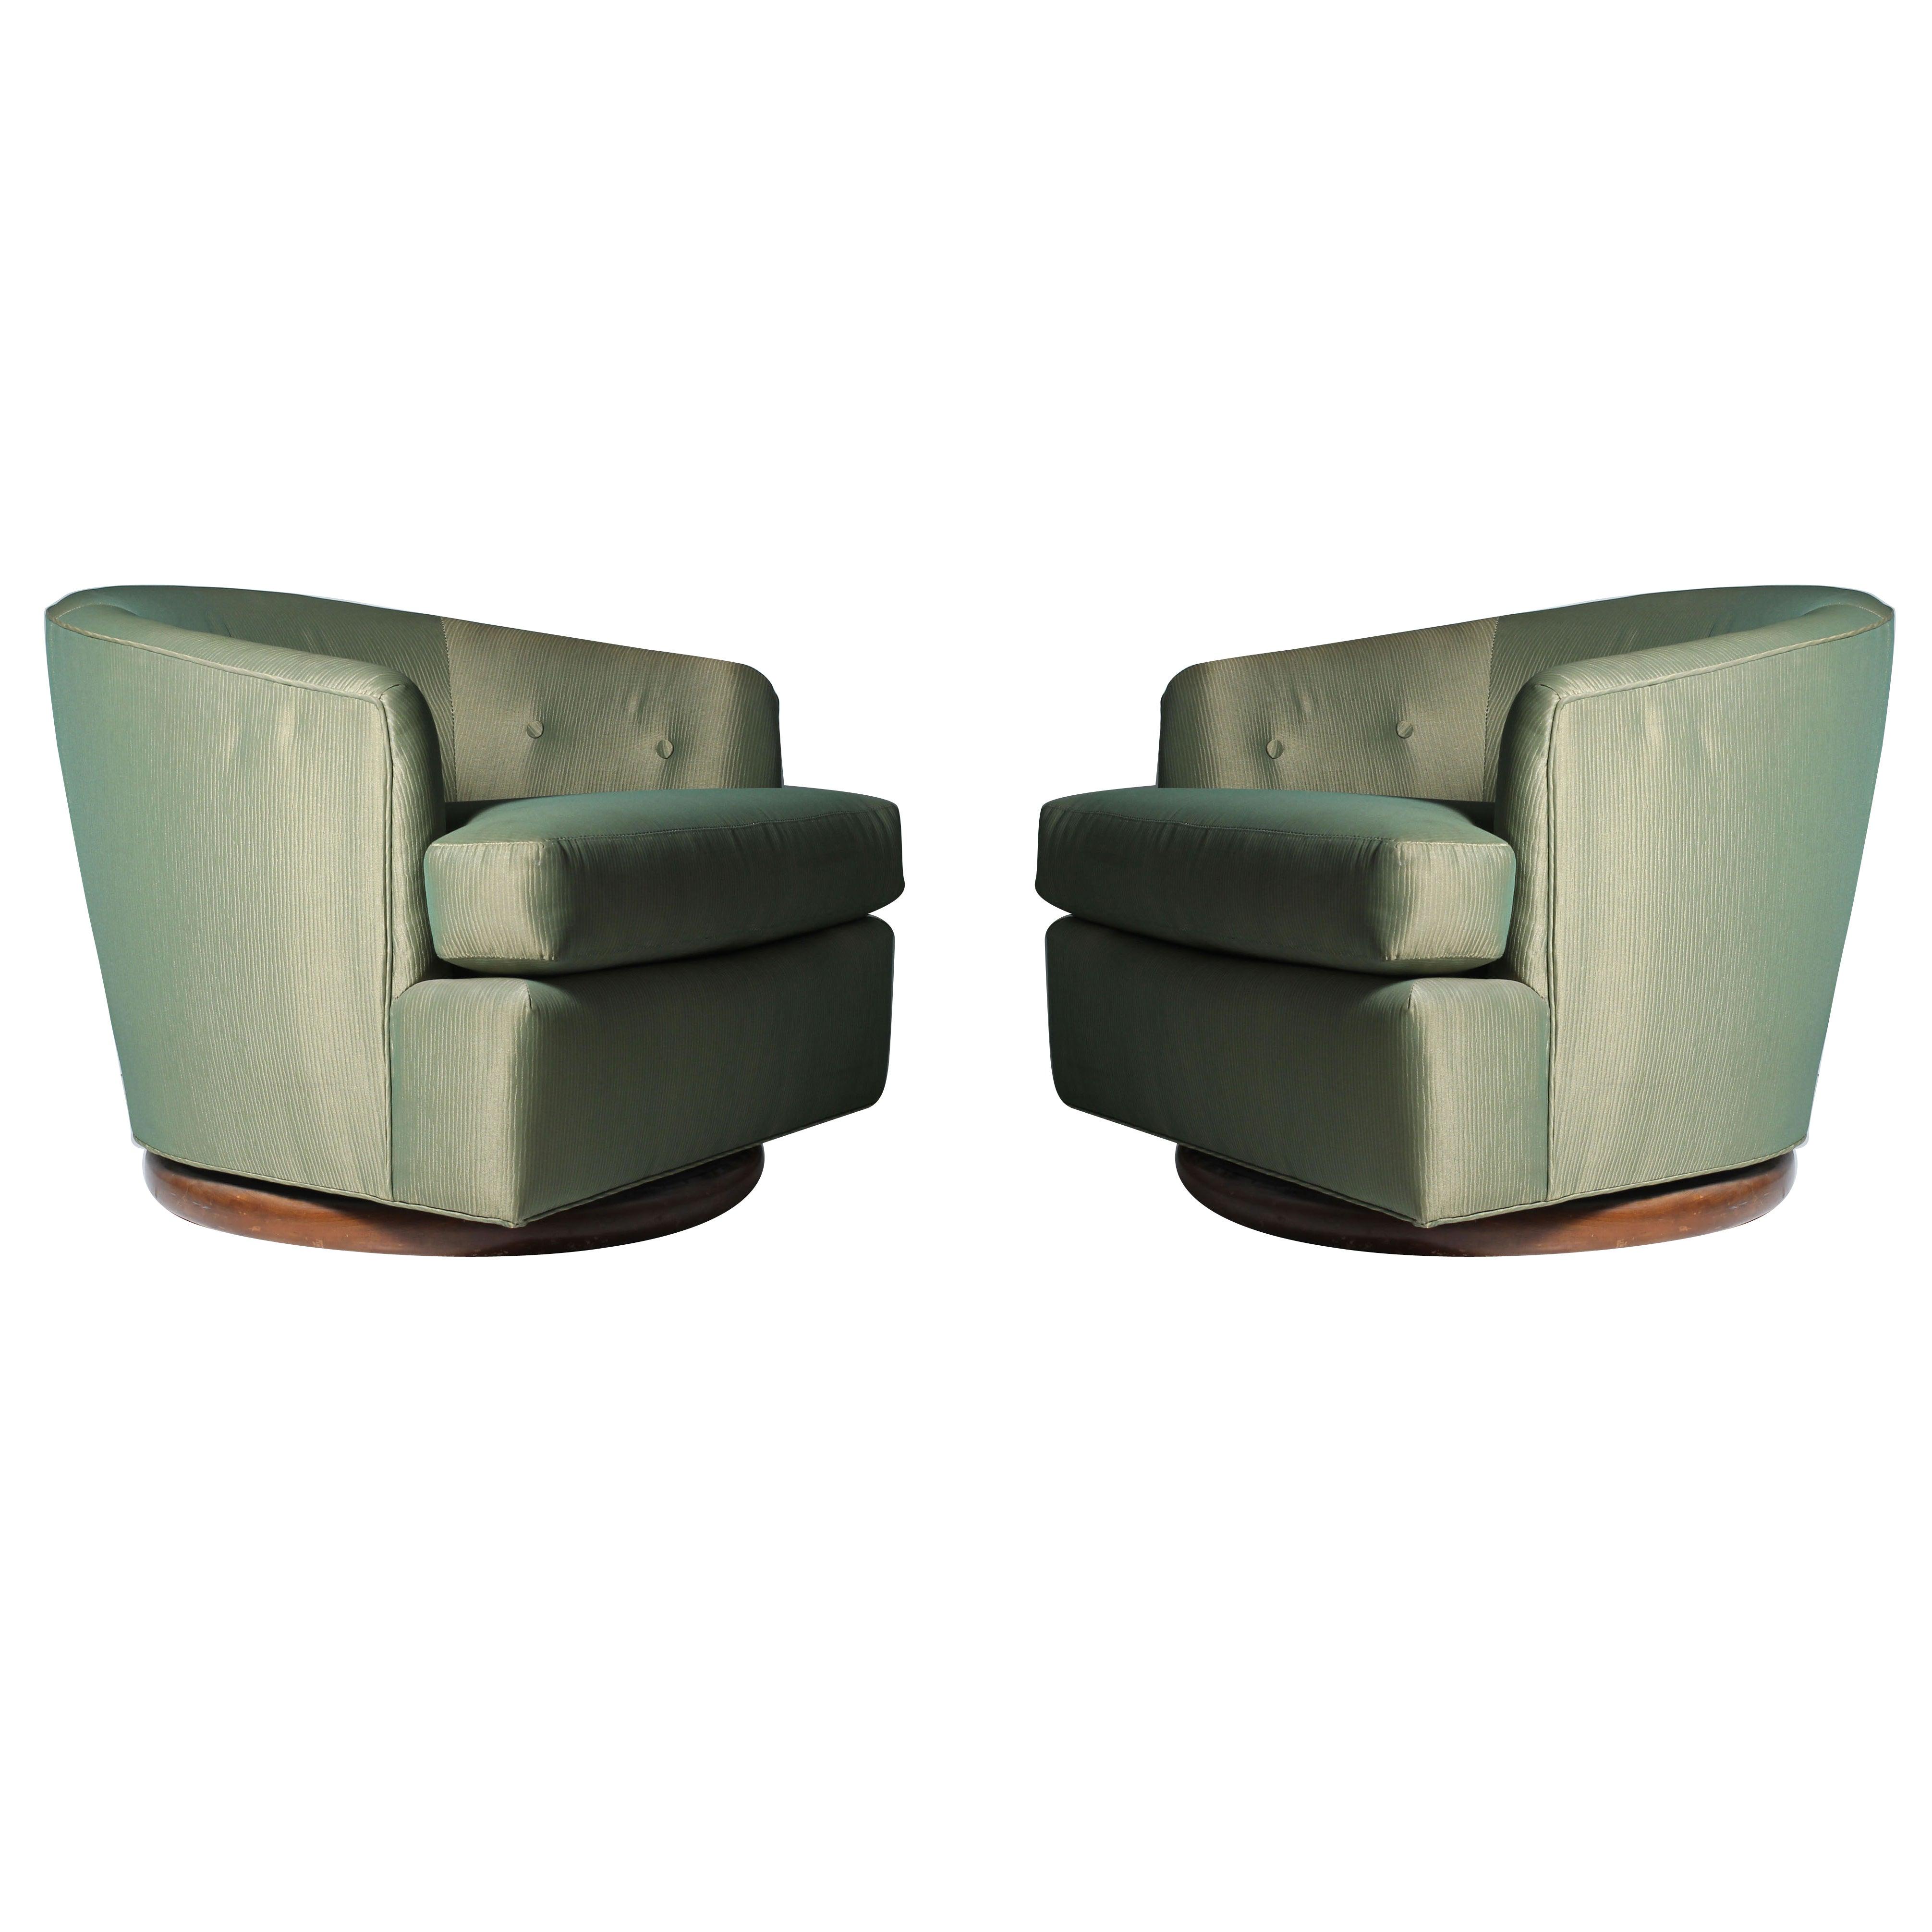 Milo Baughman Attributed Gliding / Swivel Barrel Back Club Chairs